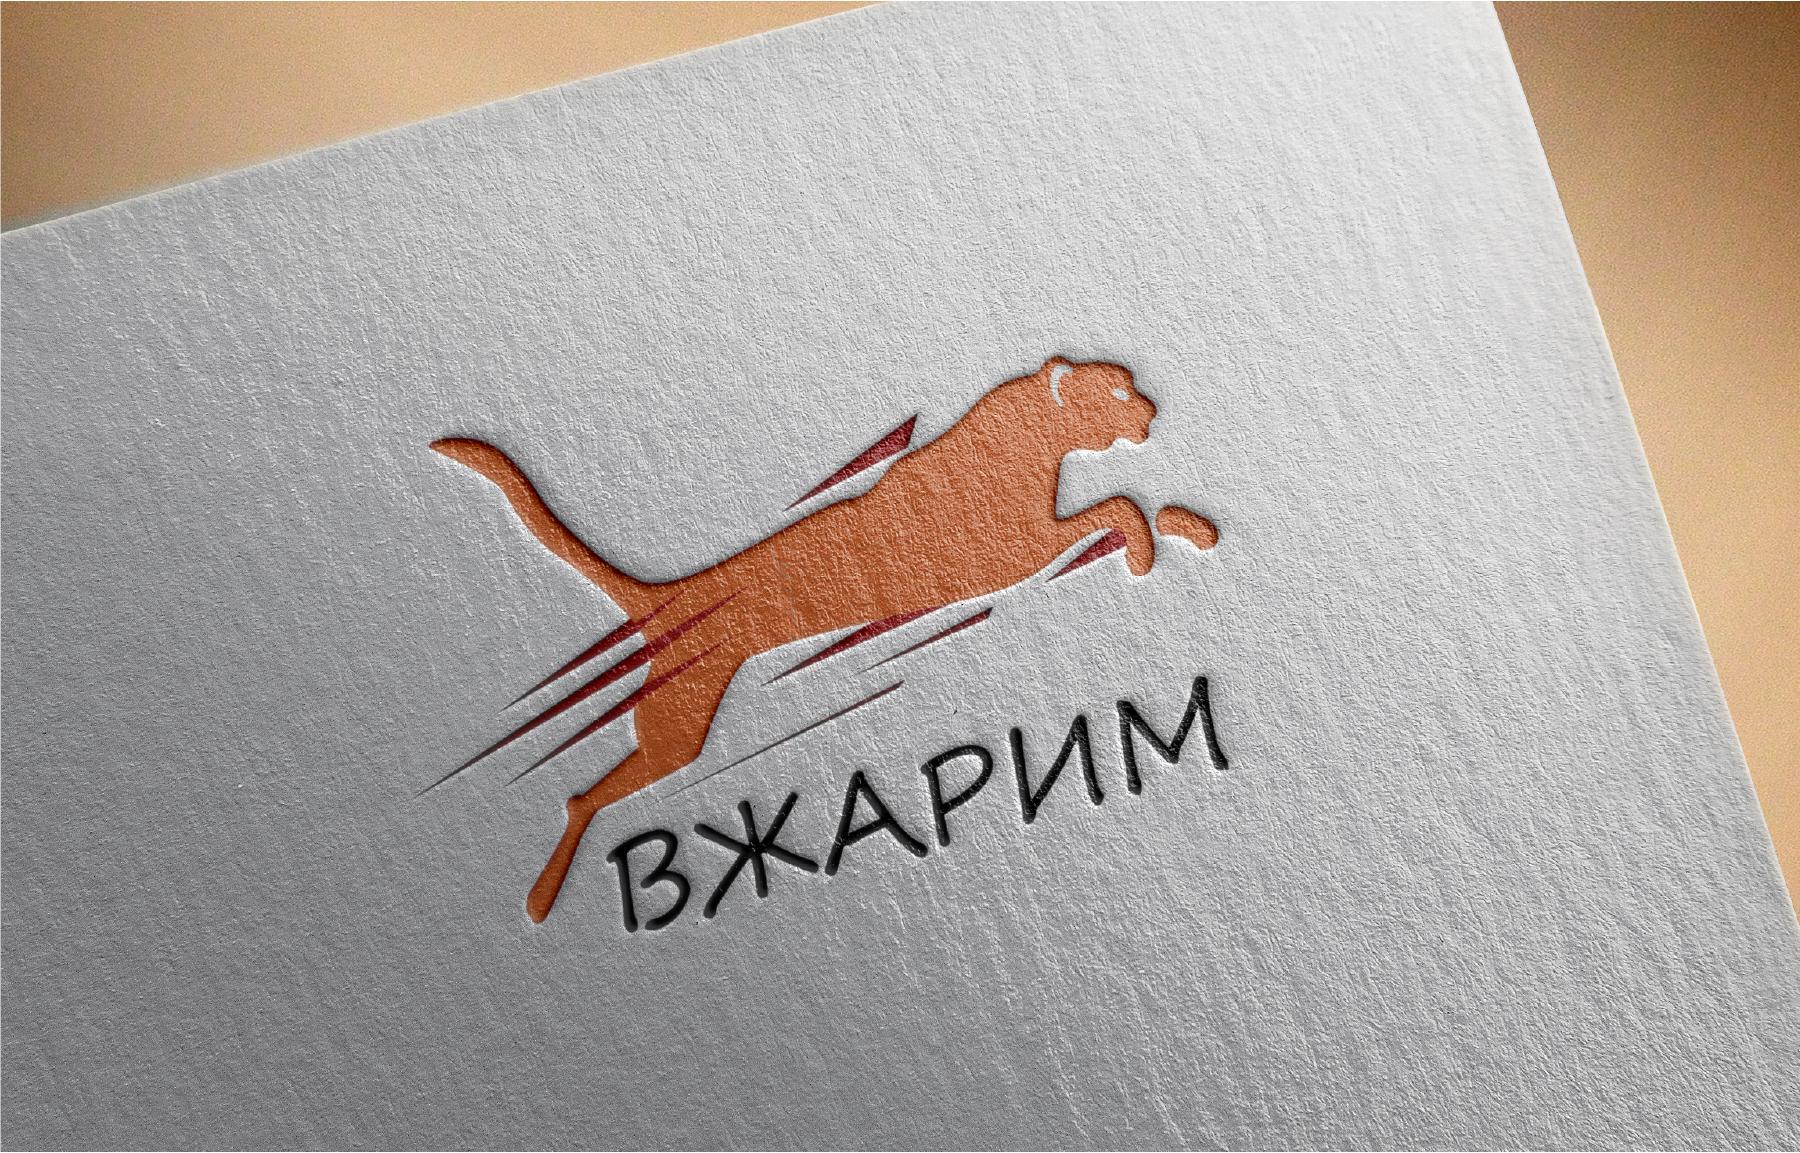 Требуется, разработка логотипа для крафт-кафе «ВЖАРИМ». фото f_279601163e6e856f.jpg